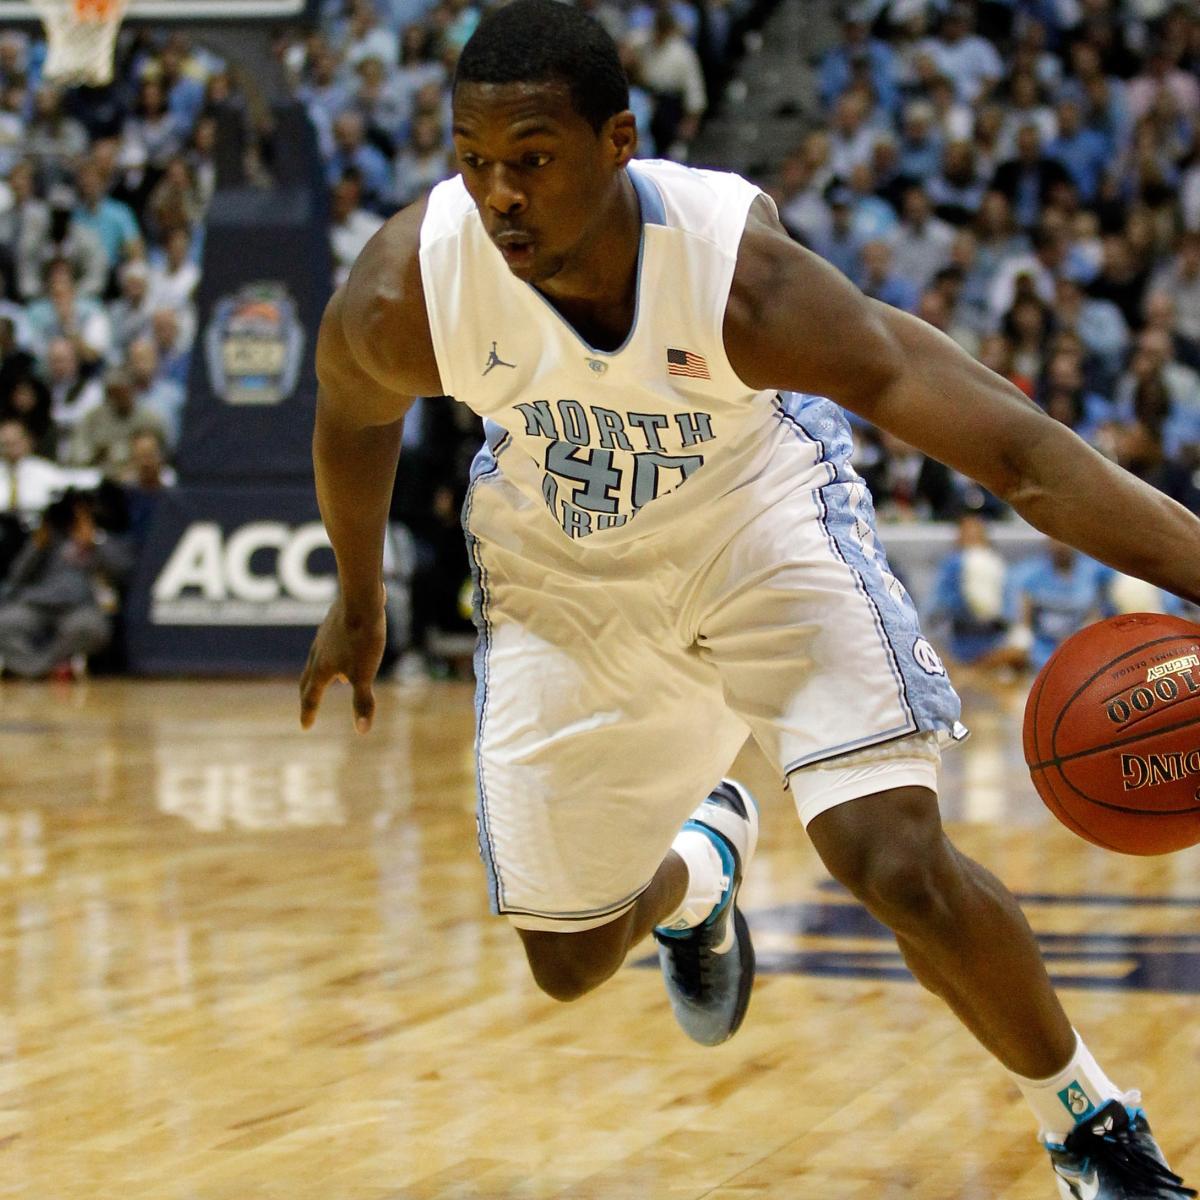 Harrison Barnes Nba: Harrison Barnes NBA Combine 2012: Measurements, Video